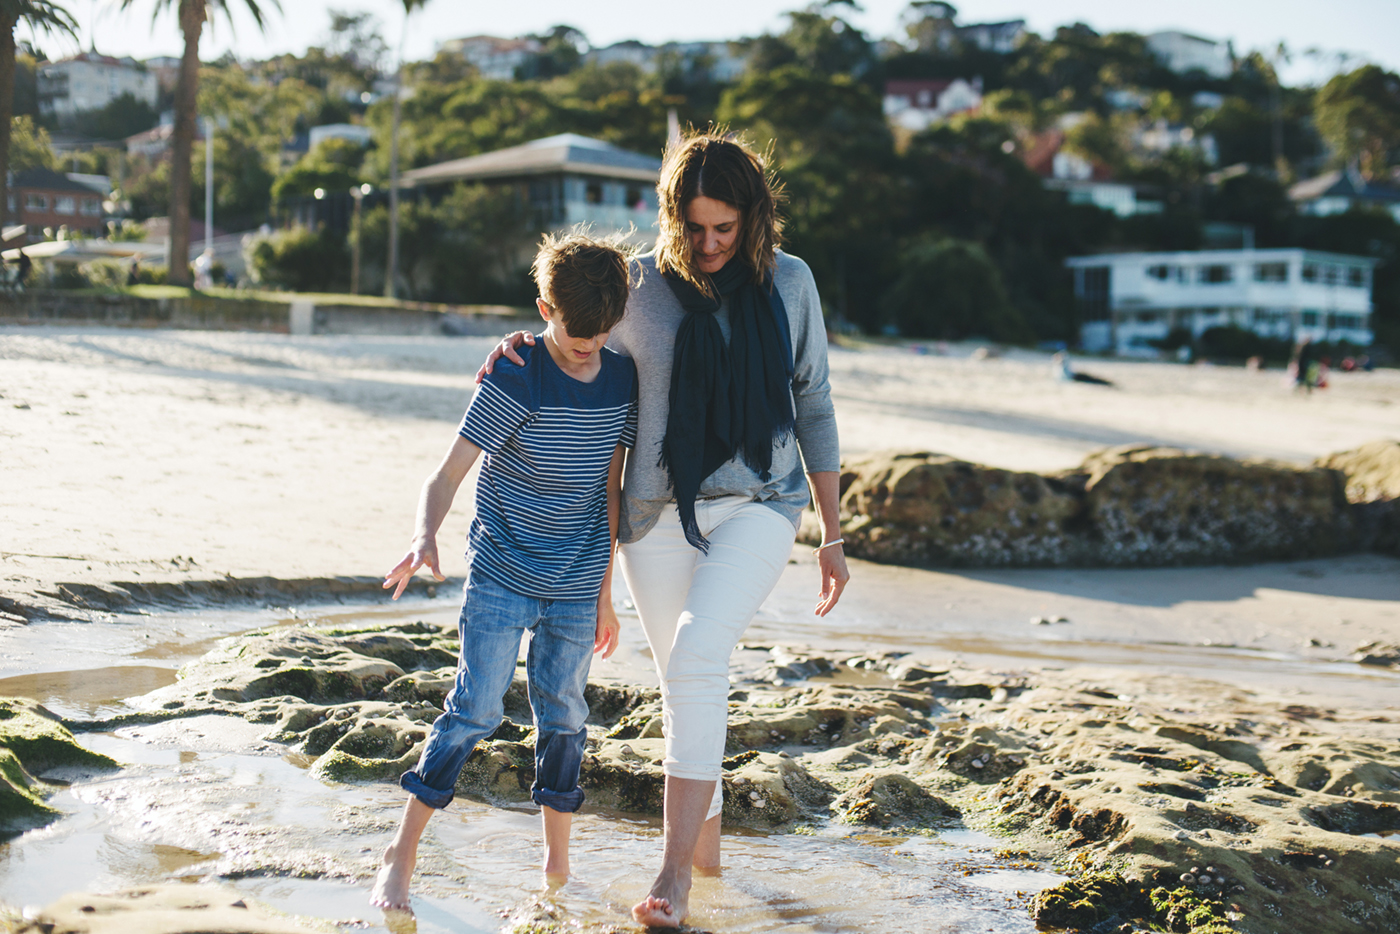 Motherhood portraits in Sydney. Sydney Lifestyle photographer. Family photos in Sydney. Mummy and Me sessions in Sydney. Beach Portraits in Northern Beaches